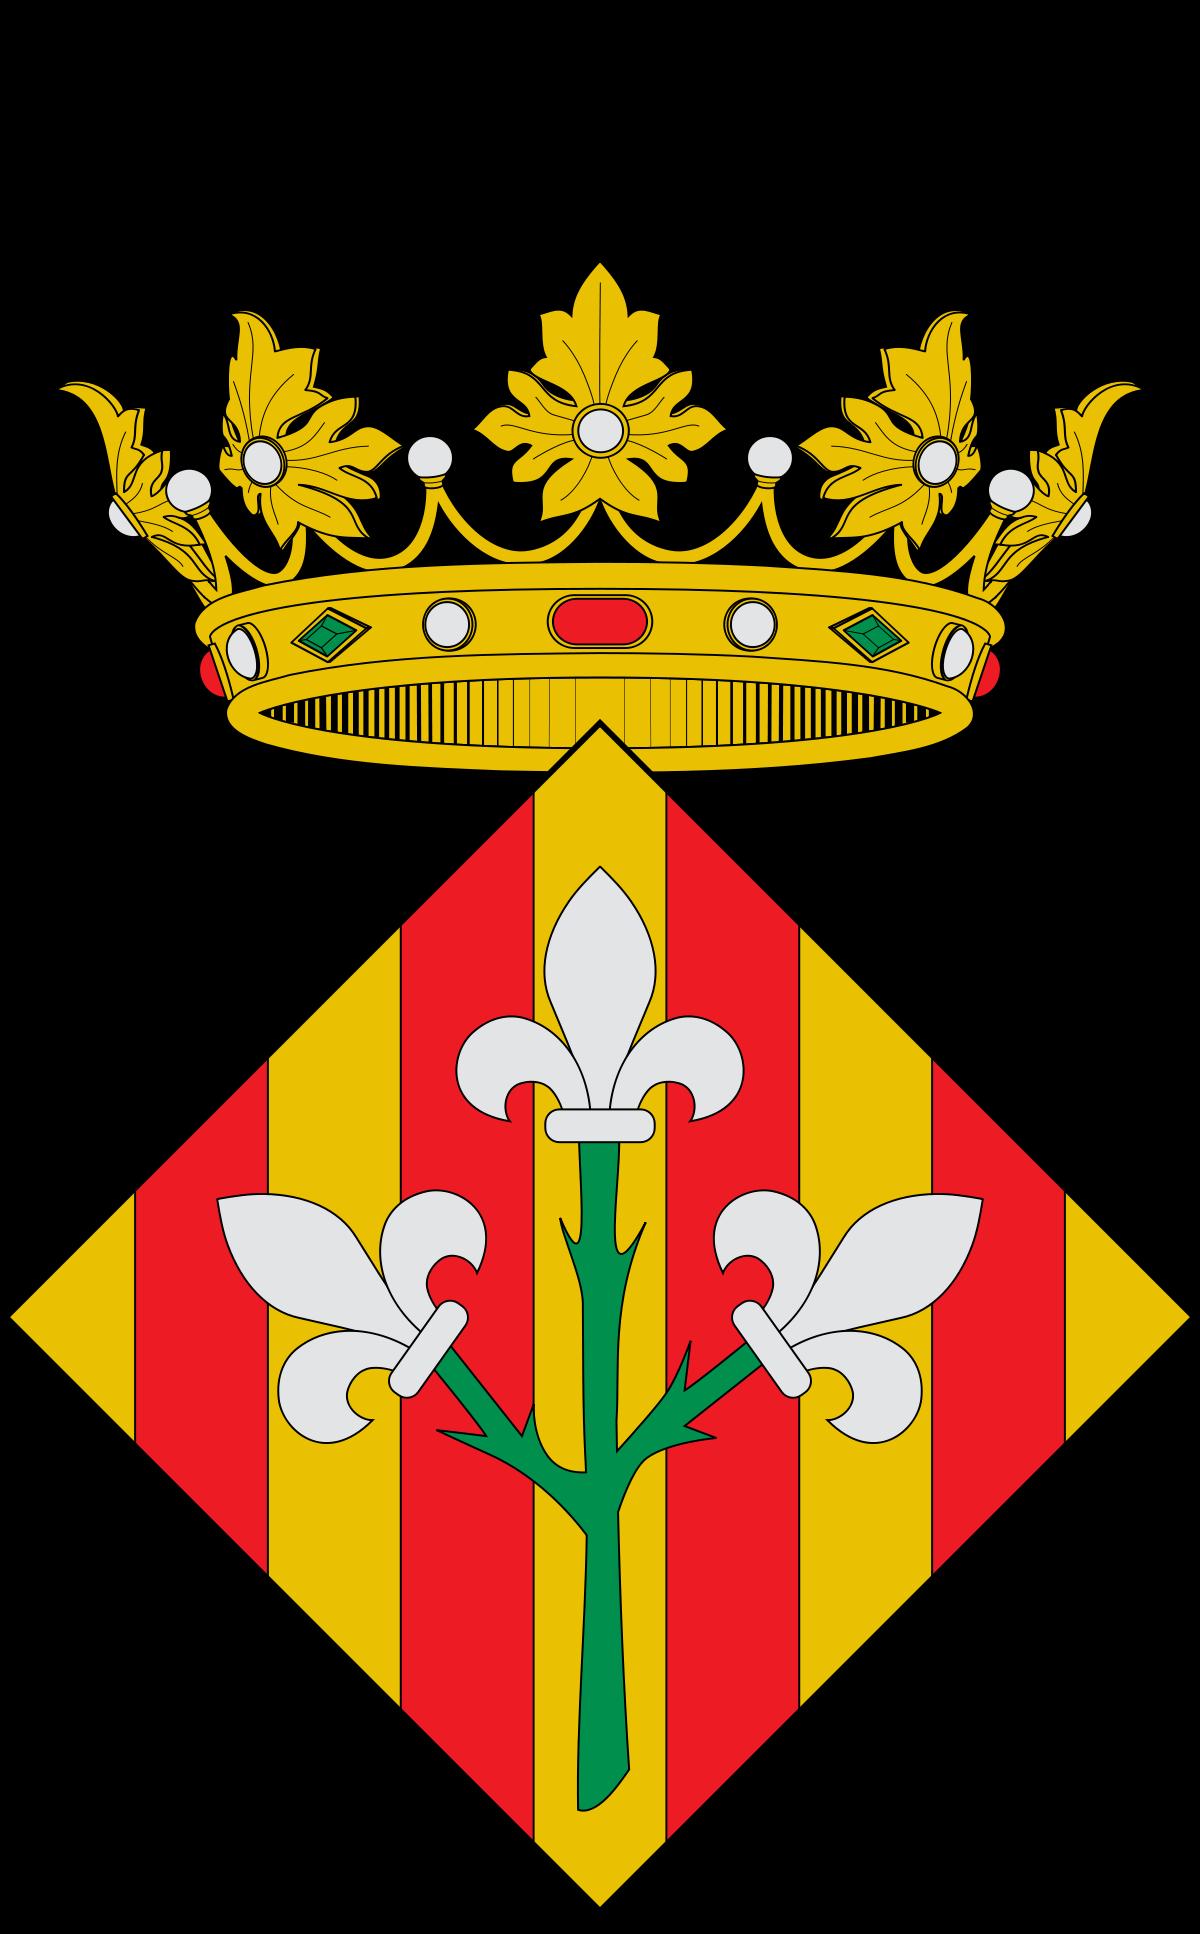 Legislación municipal en materia animal de Cataluña para Lleida